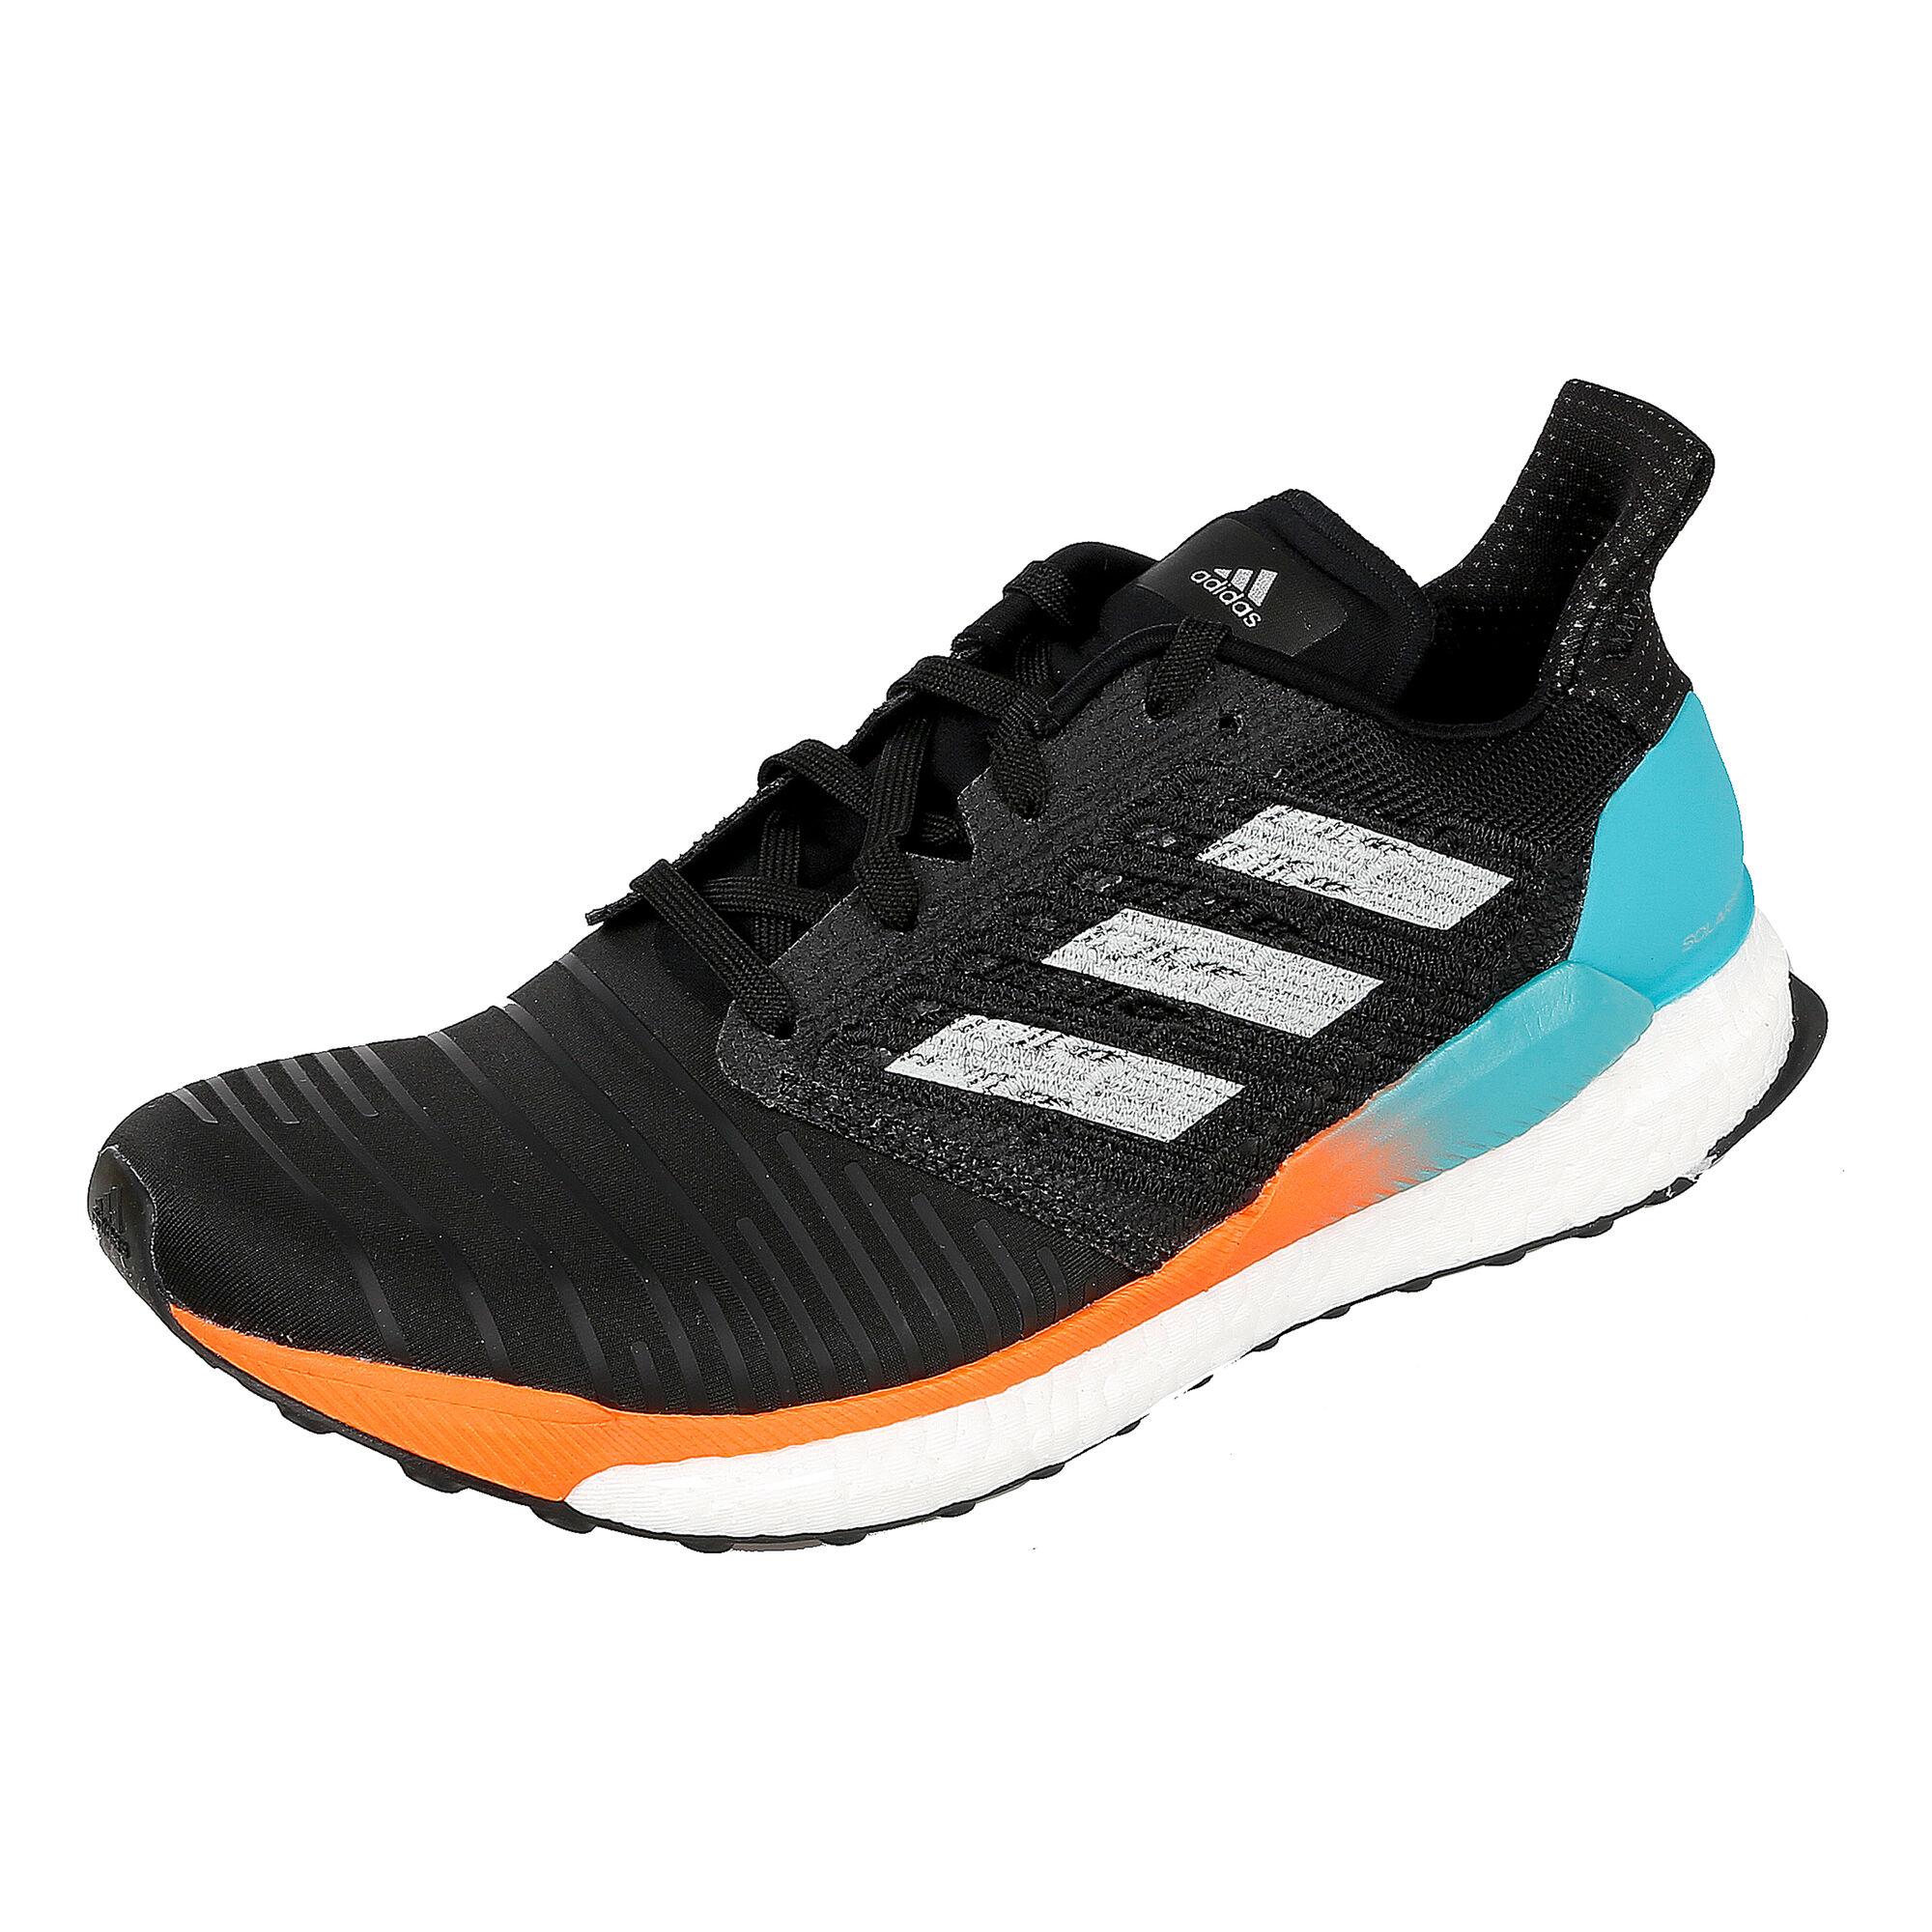 323c5d88f3f adidas · adidas · adidas · adidas · adidas · adidas · adidas · adidas ·  adidas. Solar Boost Men ...